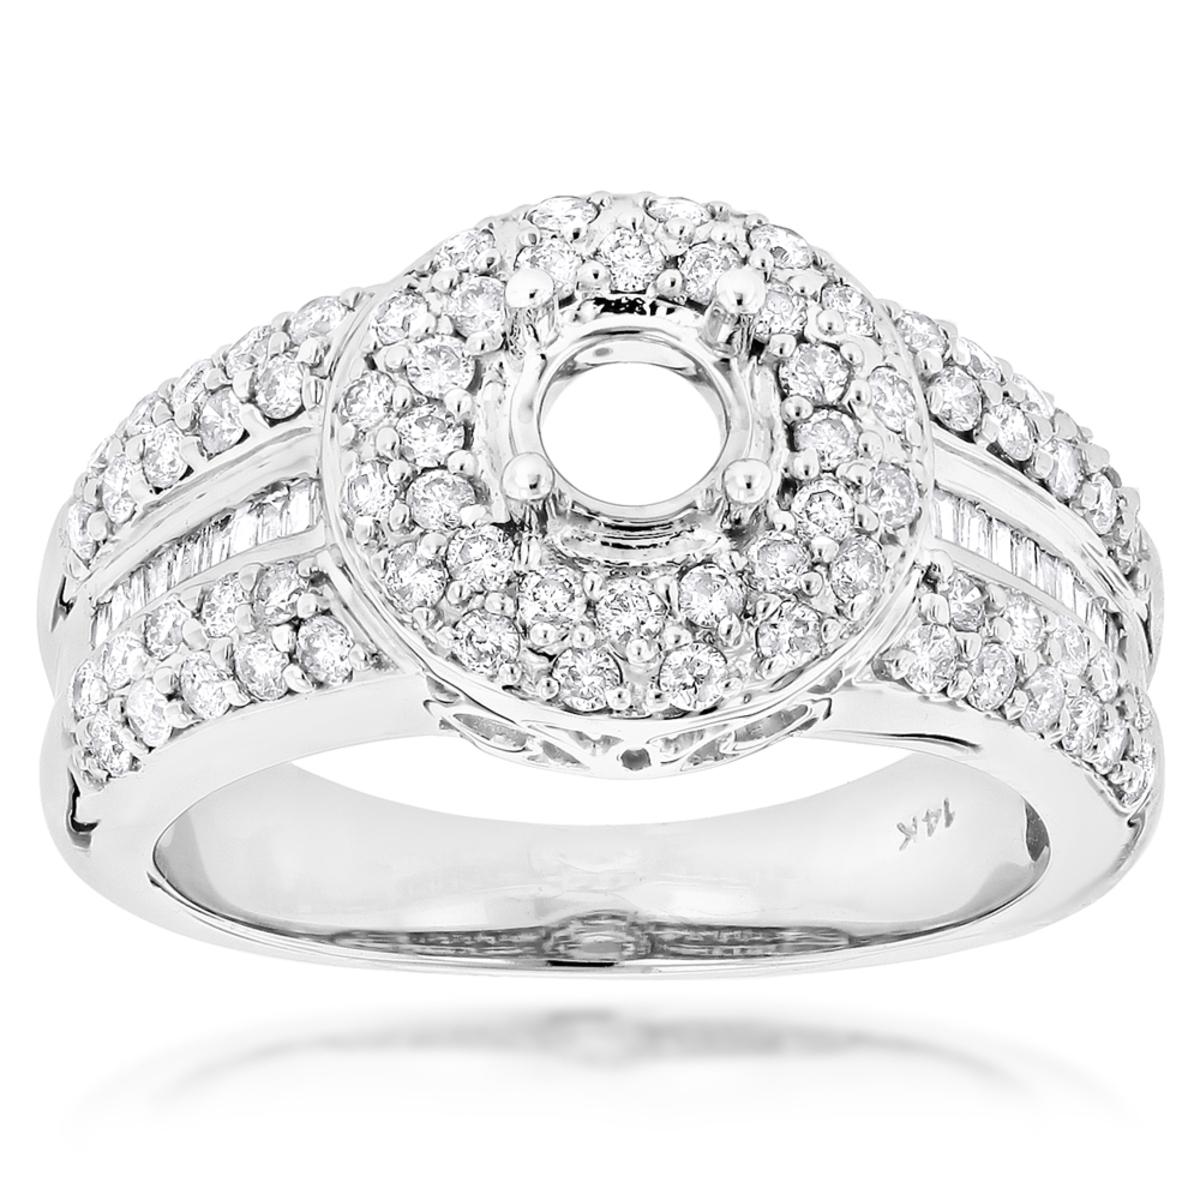 14K Gold Unique Diamond Engagement Ring Setting 1.25ct